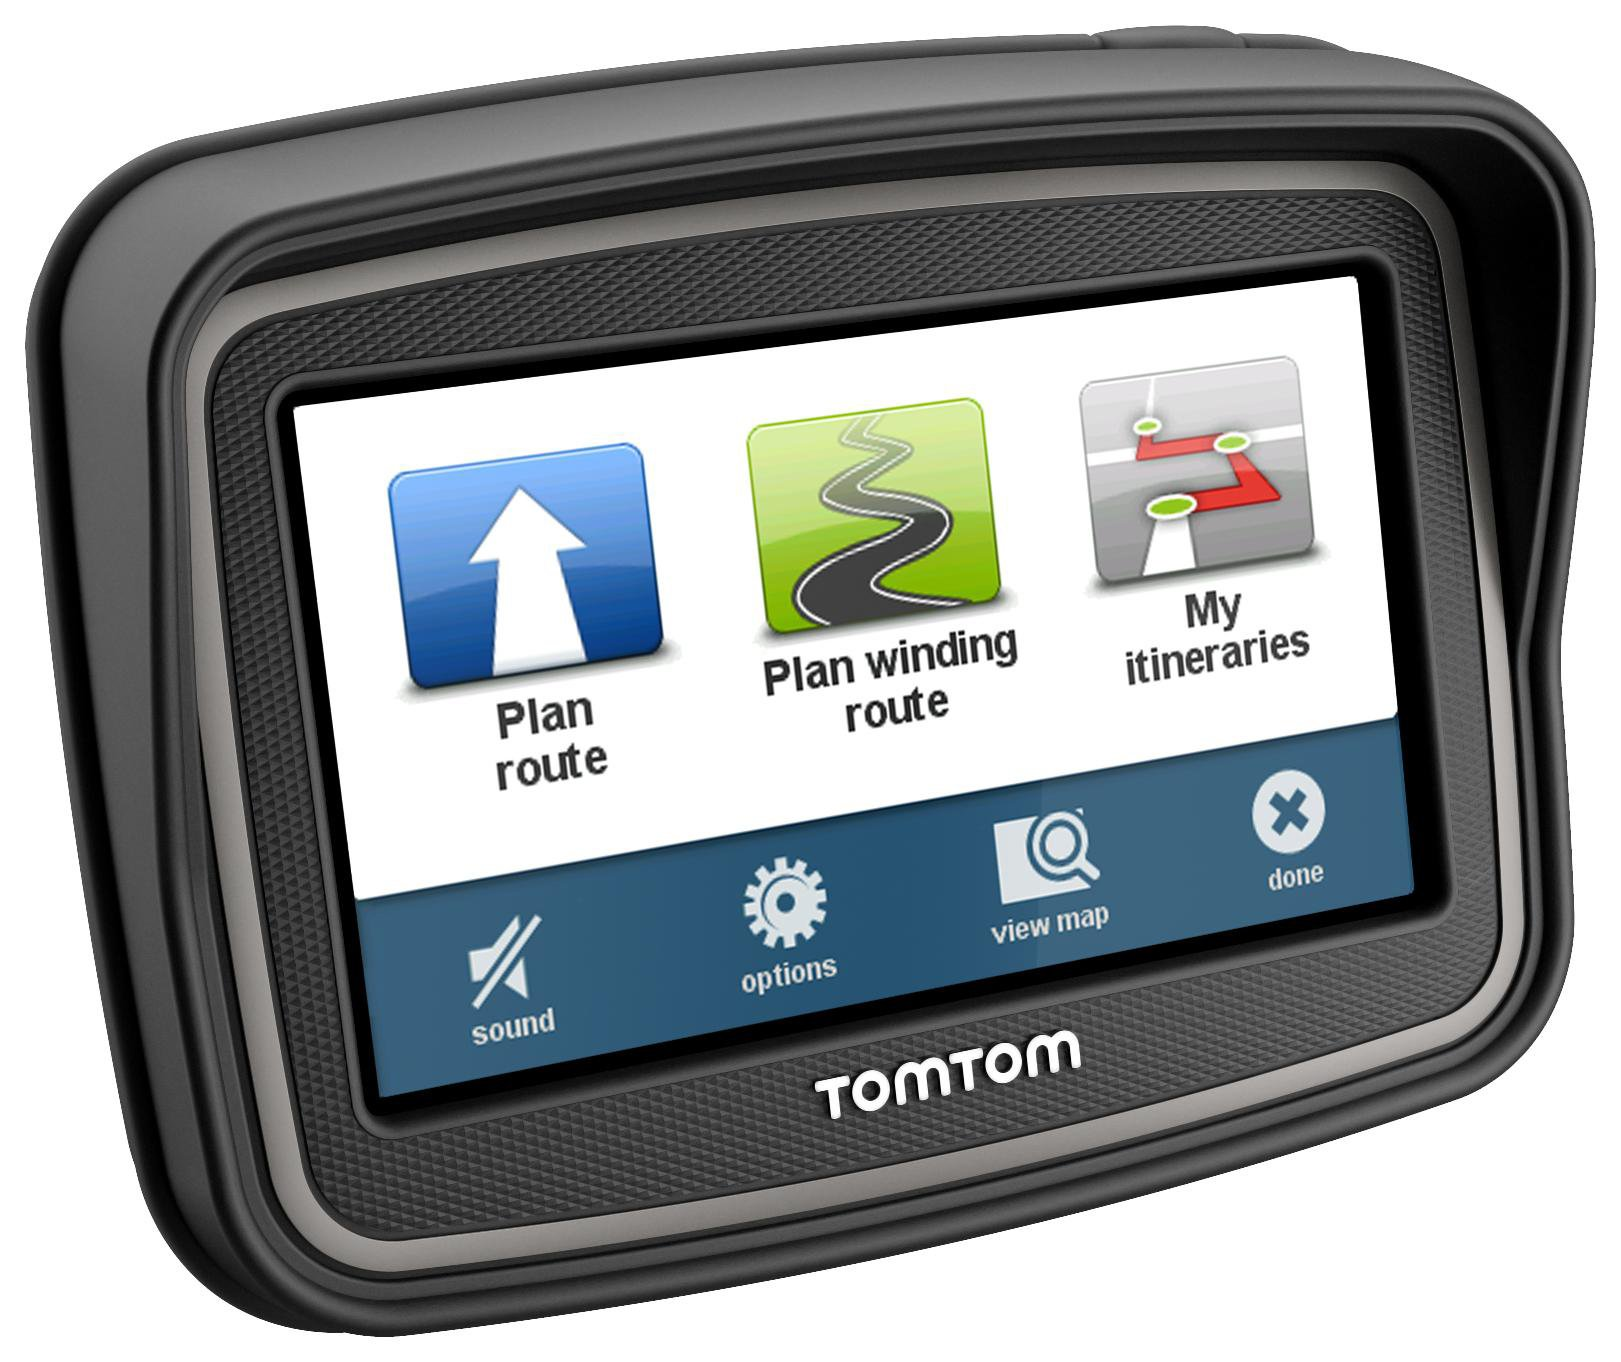 Anleitung Gerätetyp Navigationsgeräte TomTom -